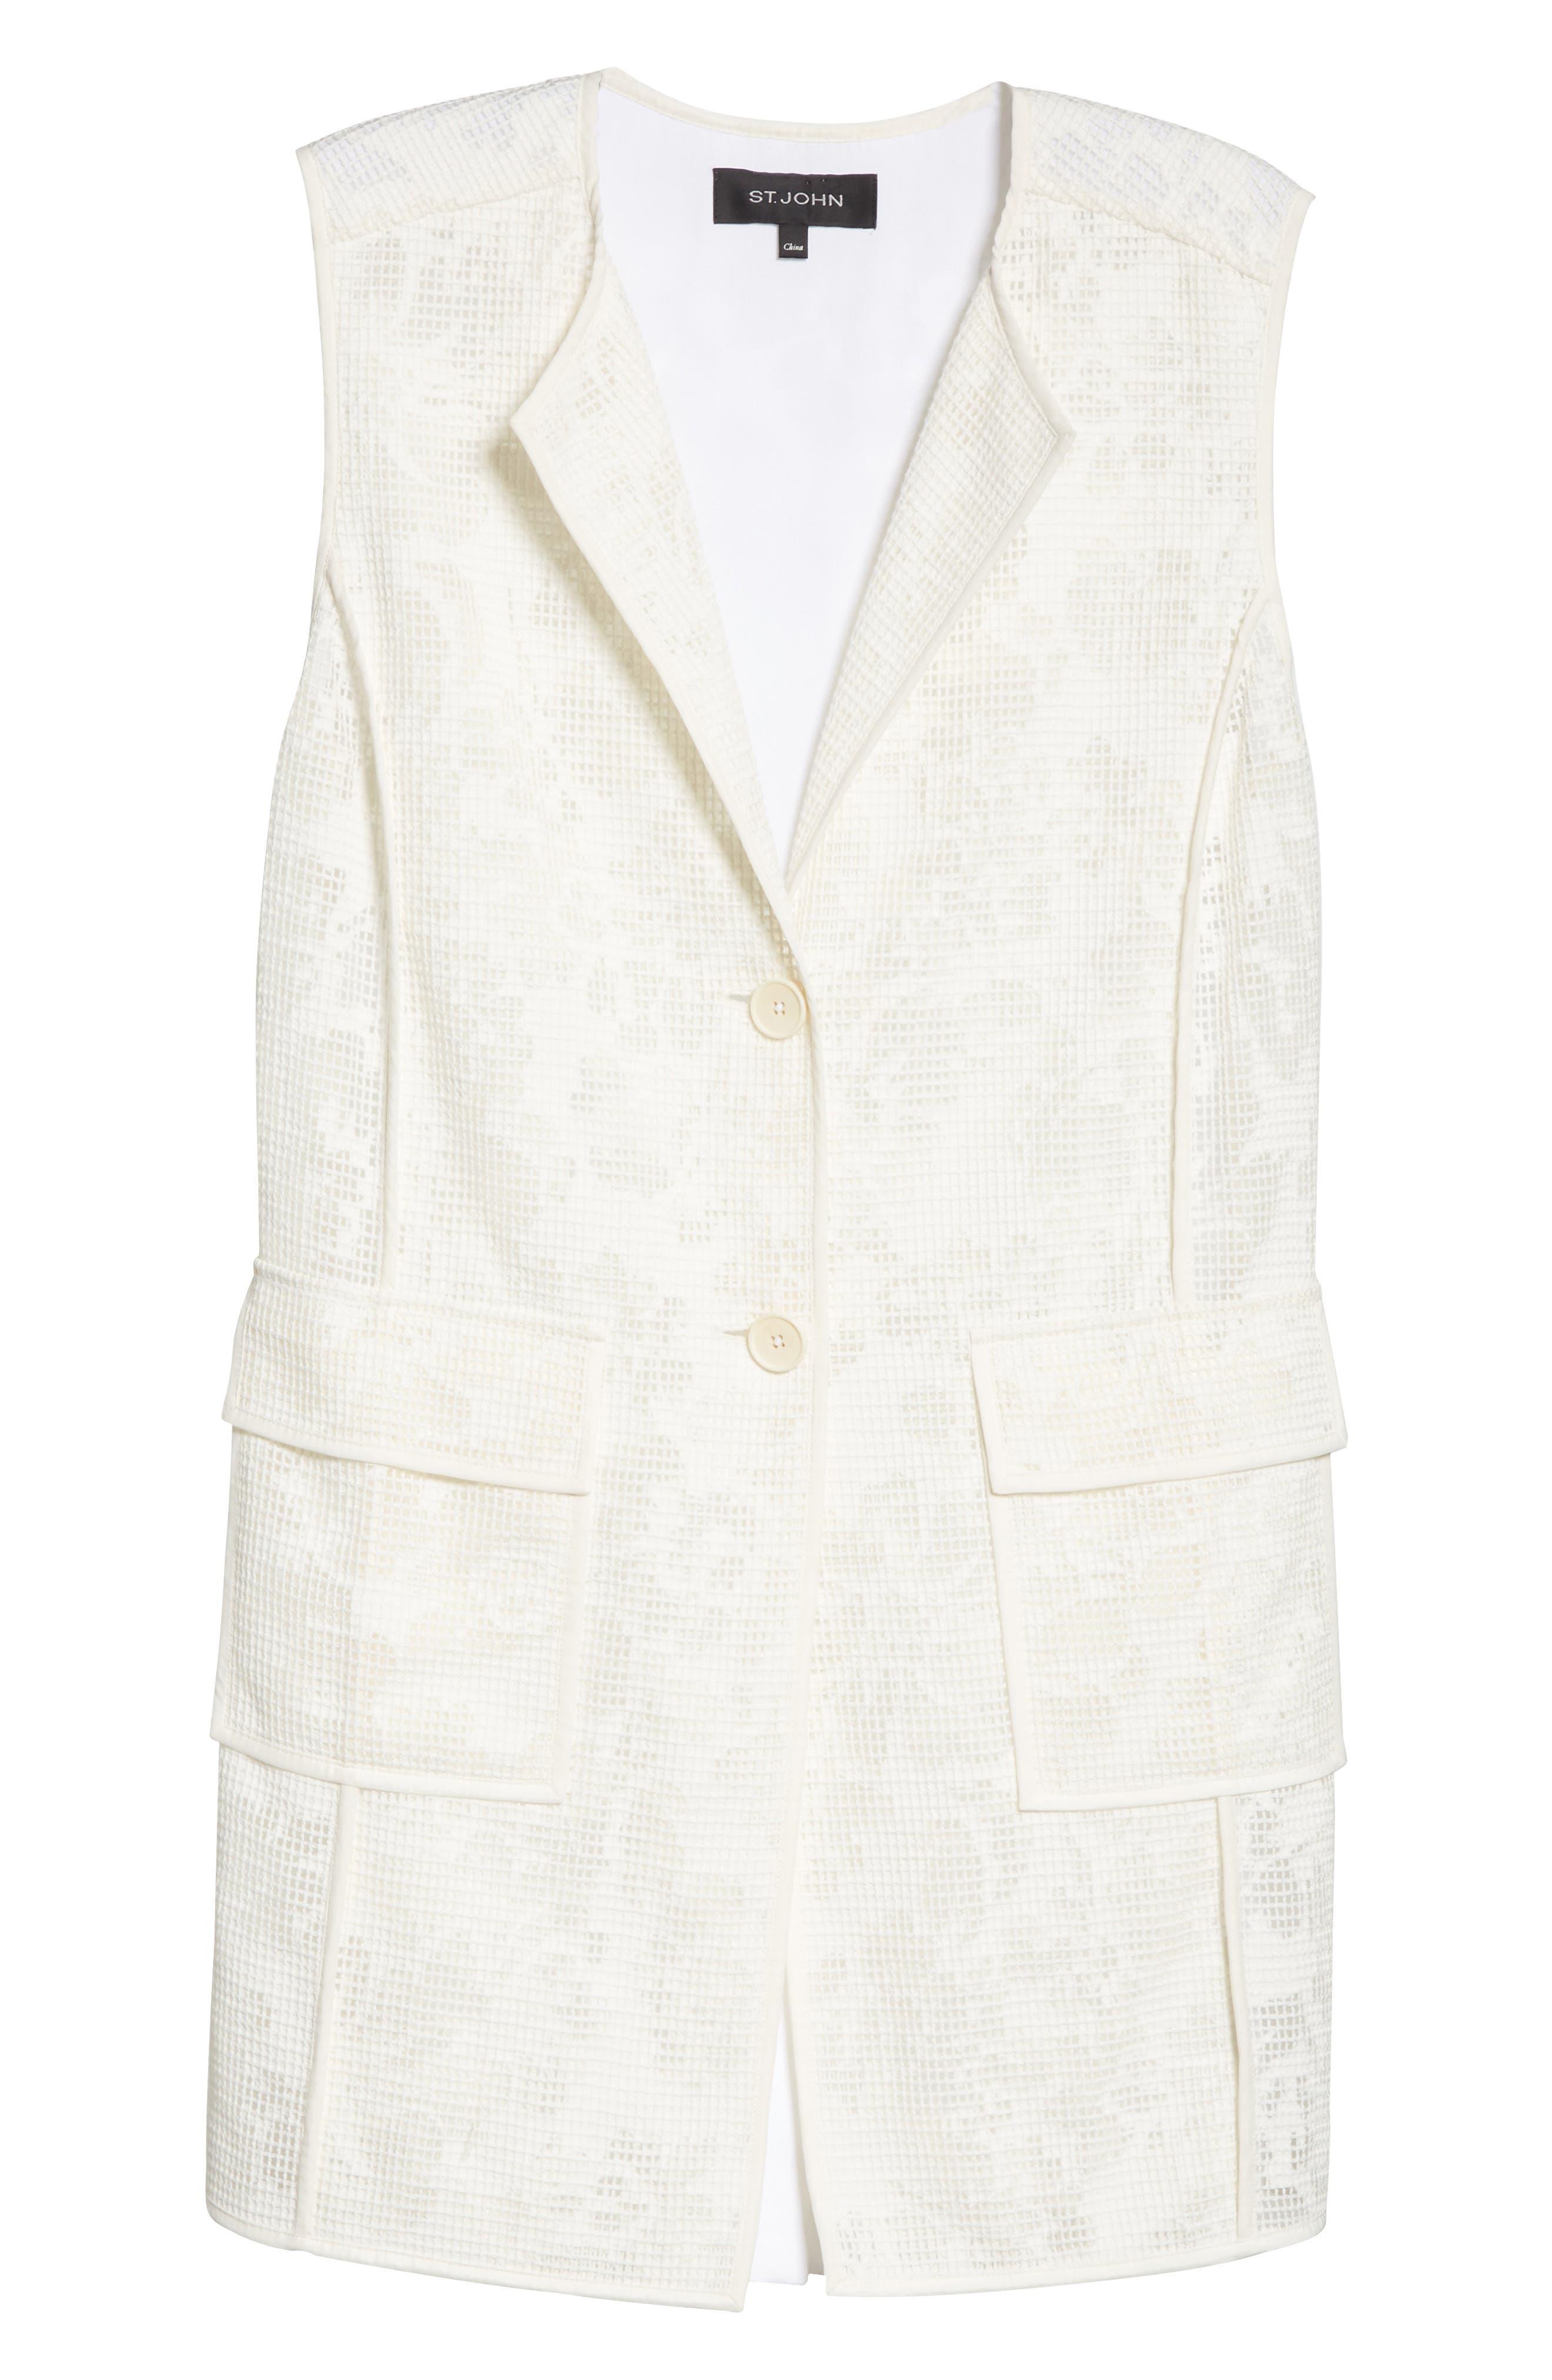 Burnout Netting Vest,                             Alternate thumbnail 5, color,                             CREAM/ BIANCO